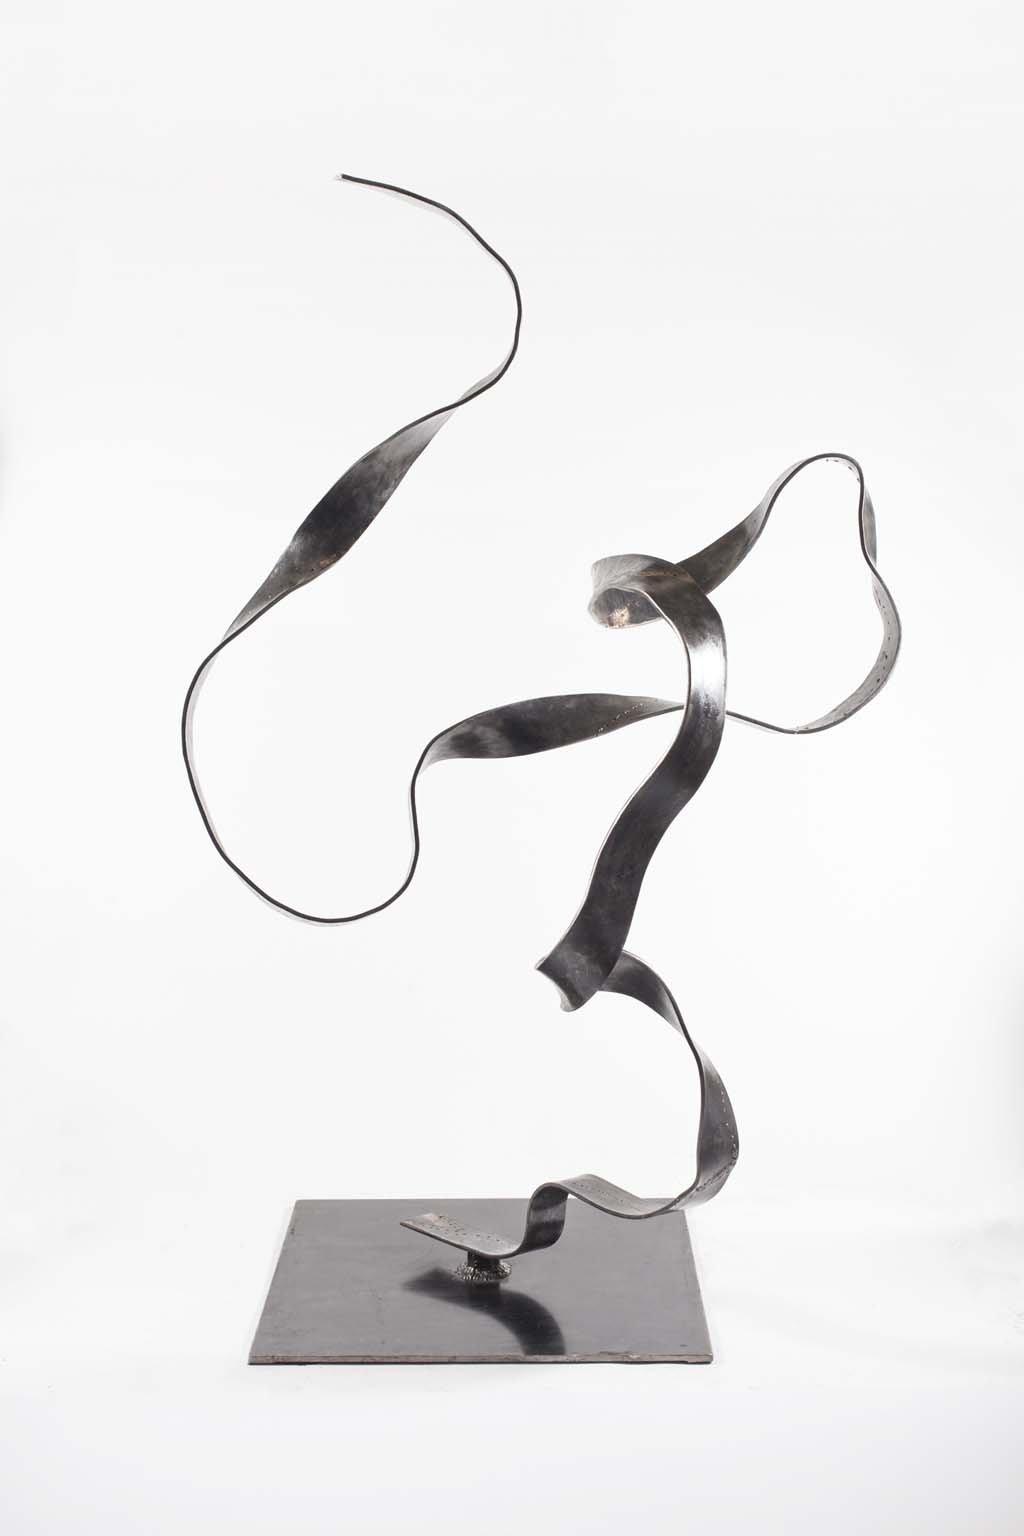 Oblivion VI | 2016 | 160x120x110 cm |  Iron & brass sculpture | Rami Ater | רמי אטר